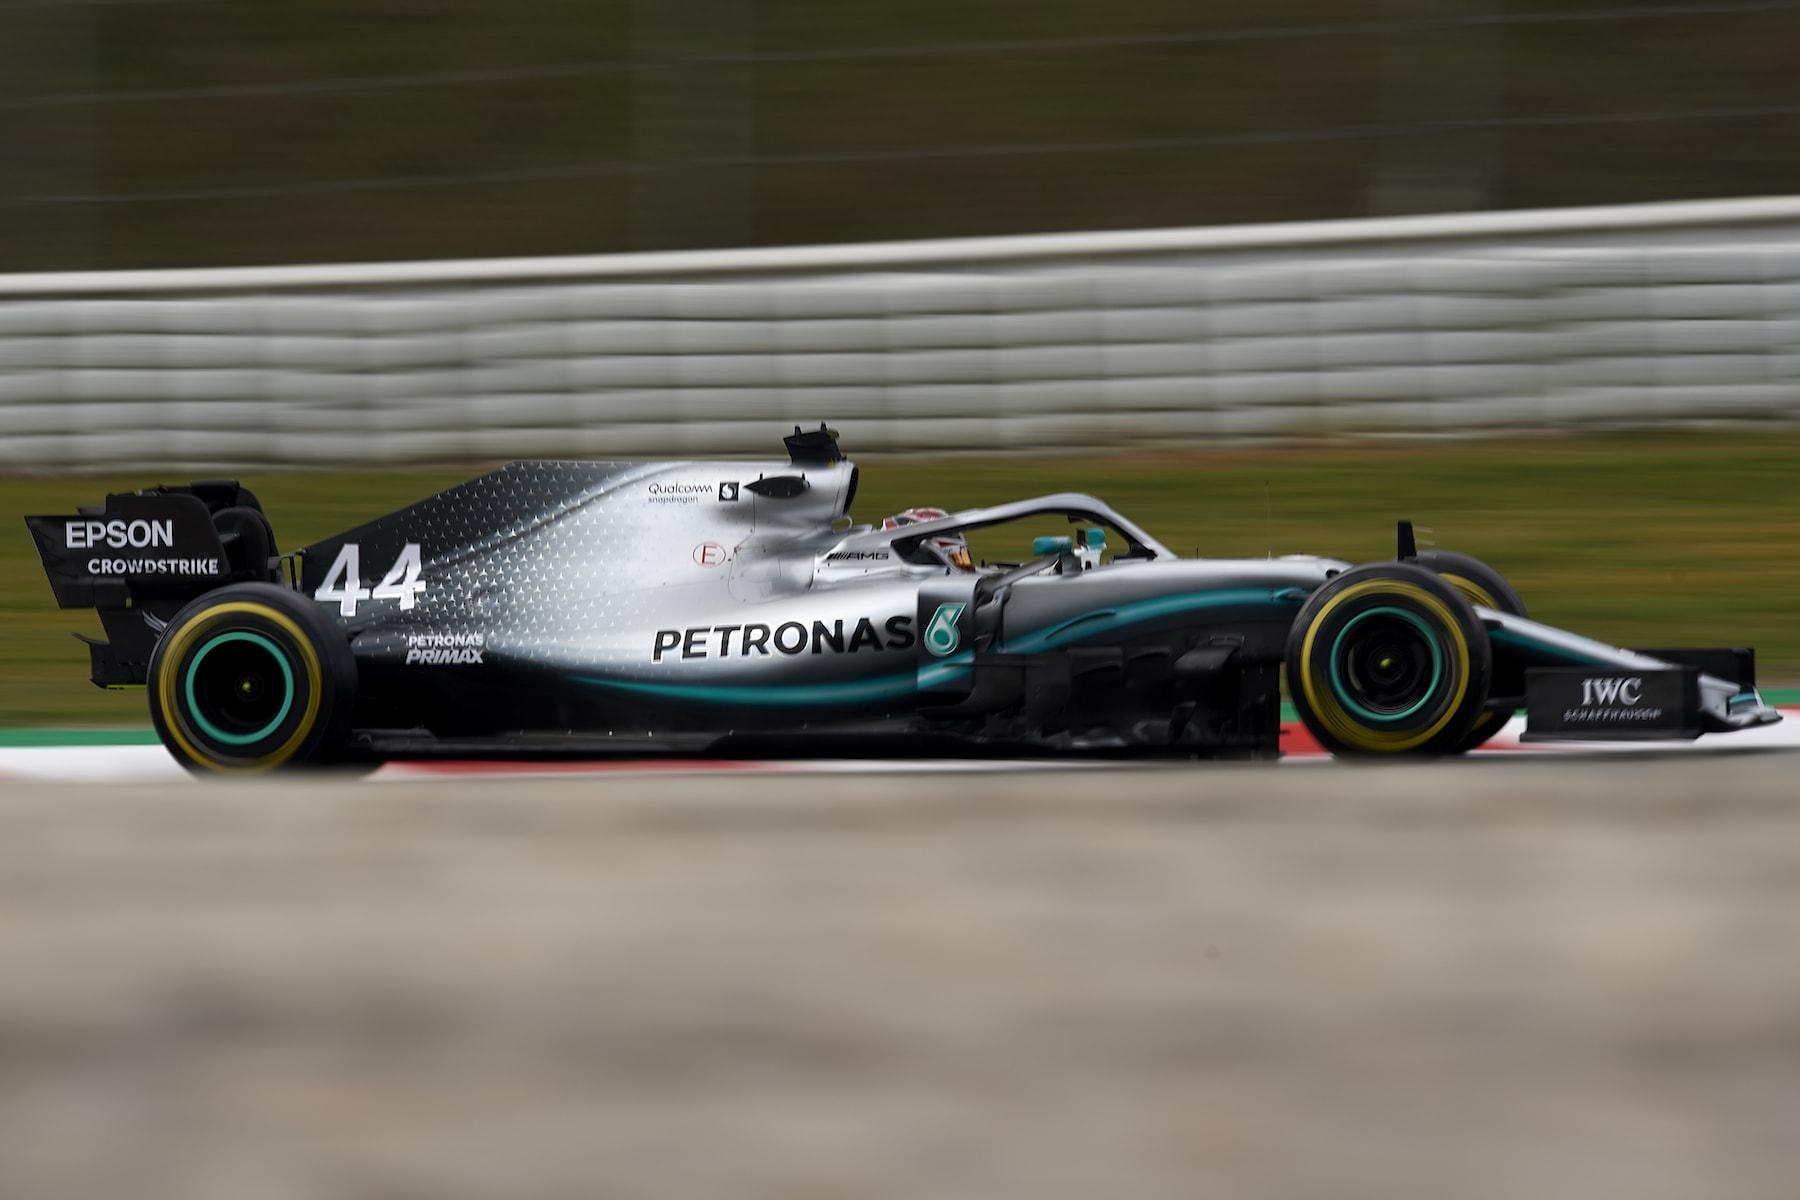 2019 Lewis Hamilton   Mercedes W10   2019 Barcelona T1 D2 2 copy.jpg